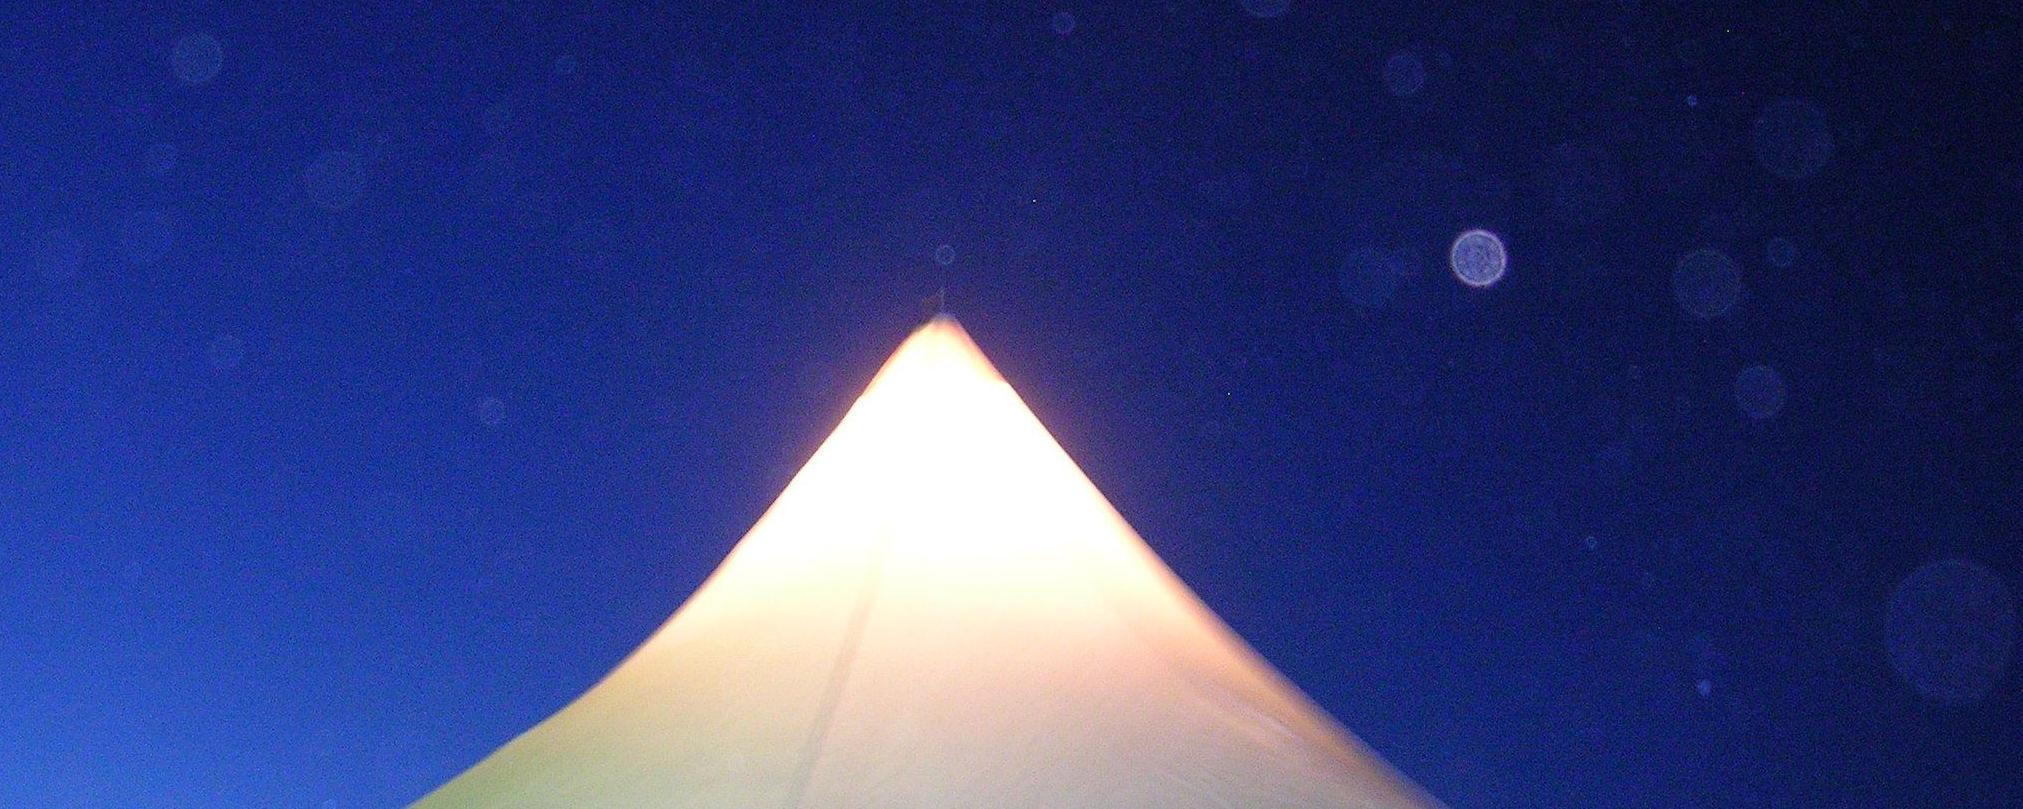 Magical Tent Top iii.jpg